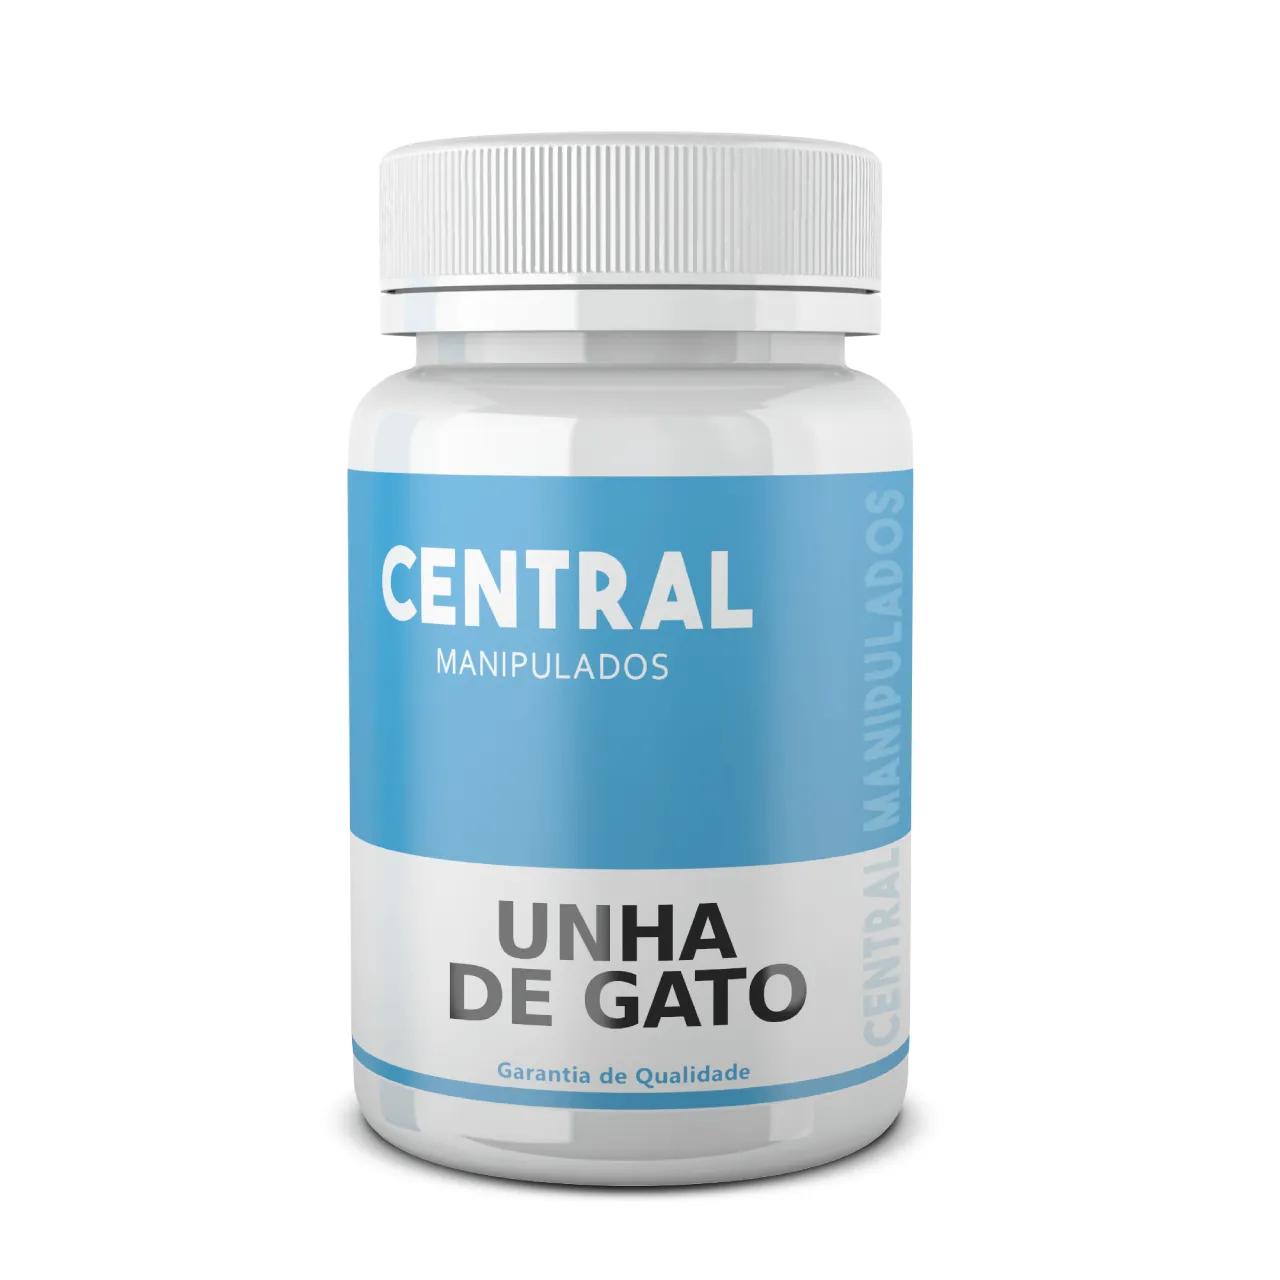 Unha de Gato 500mg - 60 Cápsulas - Reduz a dor da Artrite, Gota, Osteoporose, Reumatismo. Aumenta Imunidade.